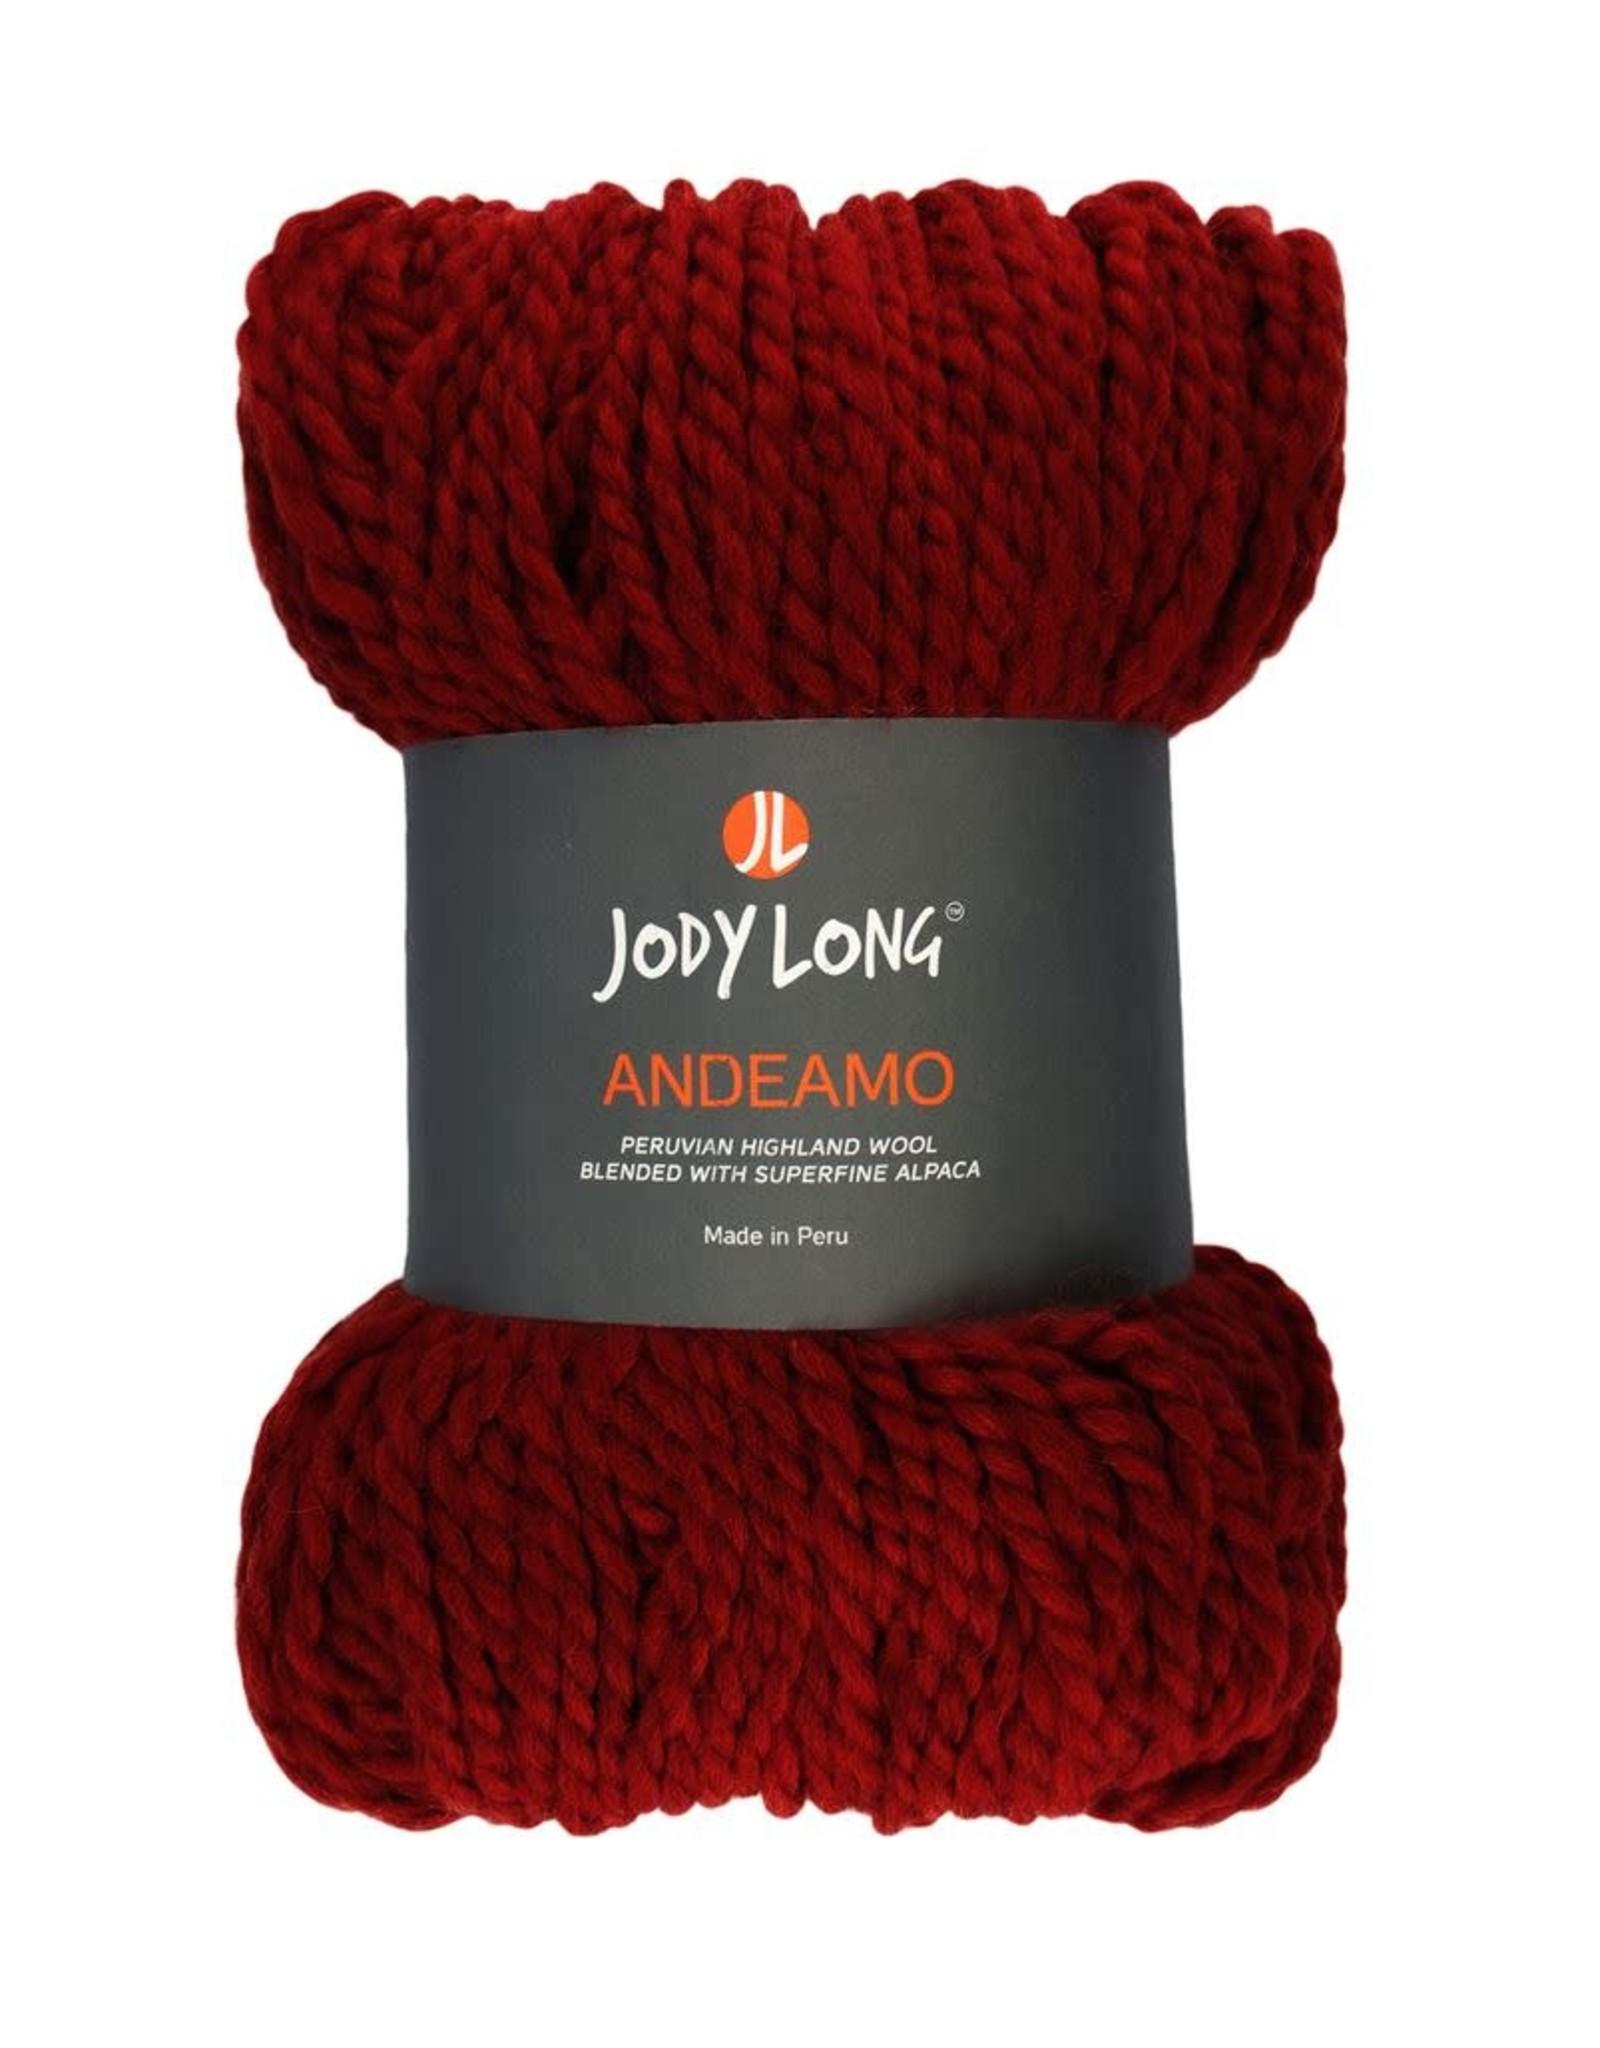 Jody Long Andeamo #016 Claret